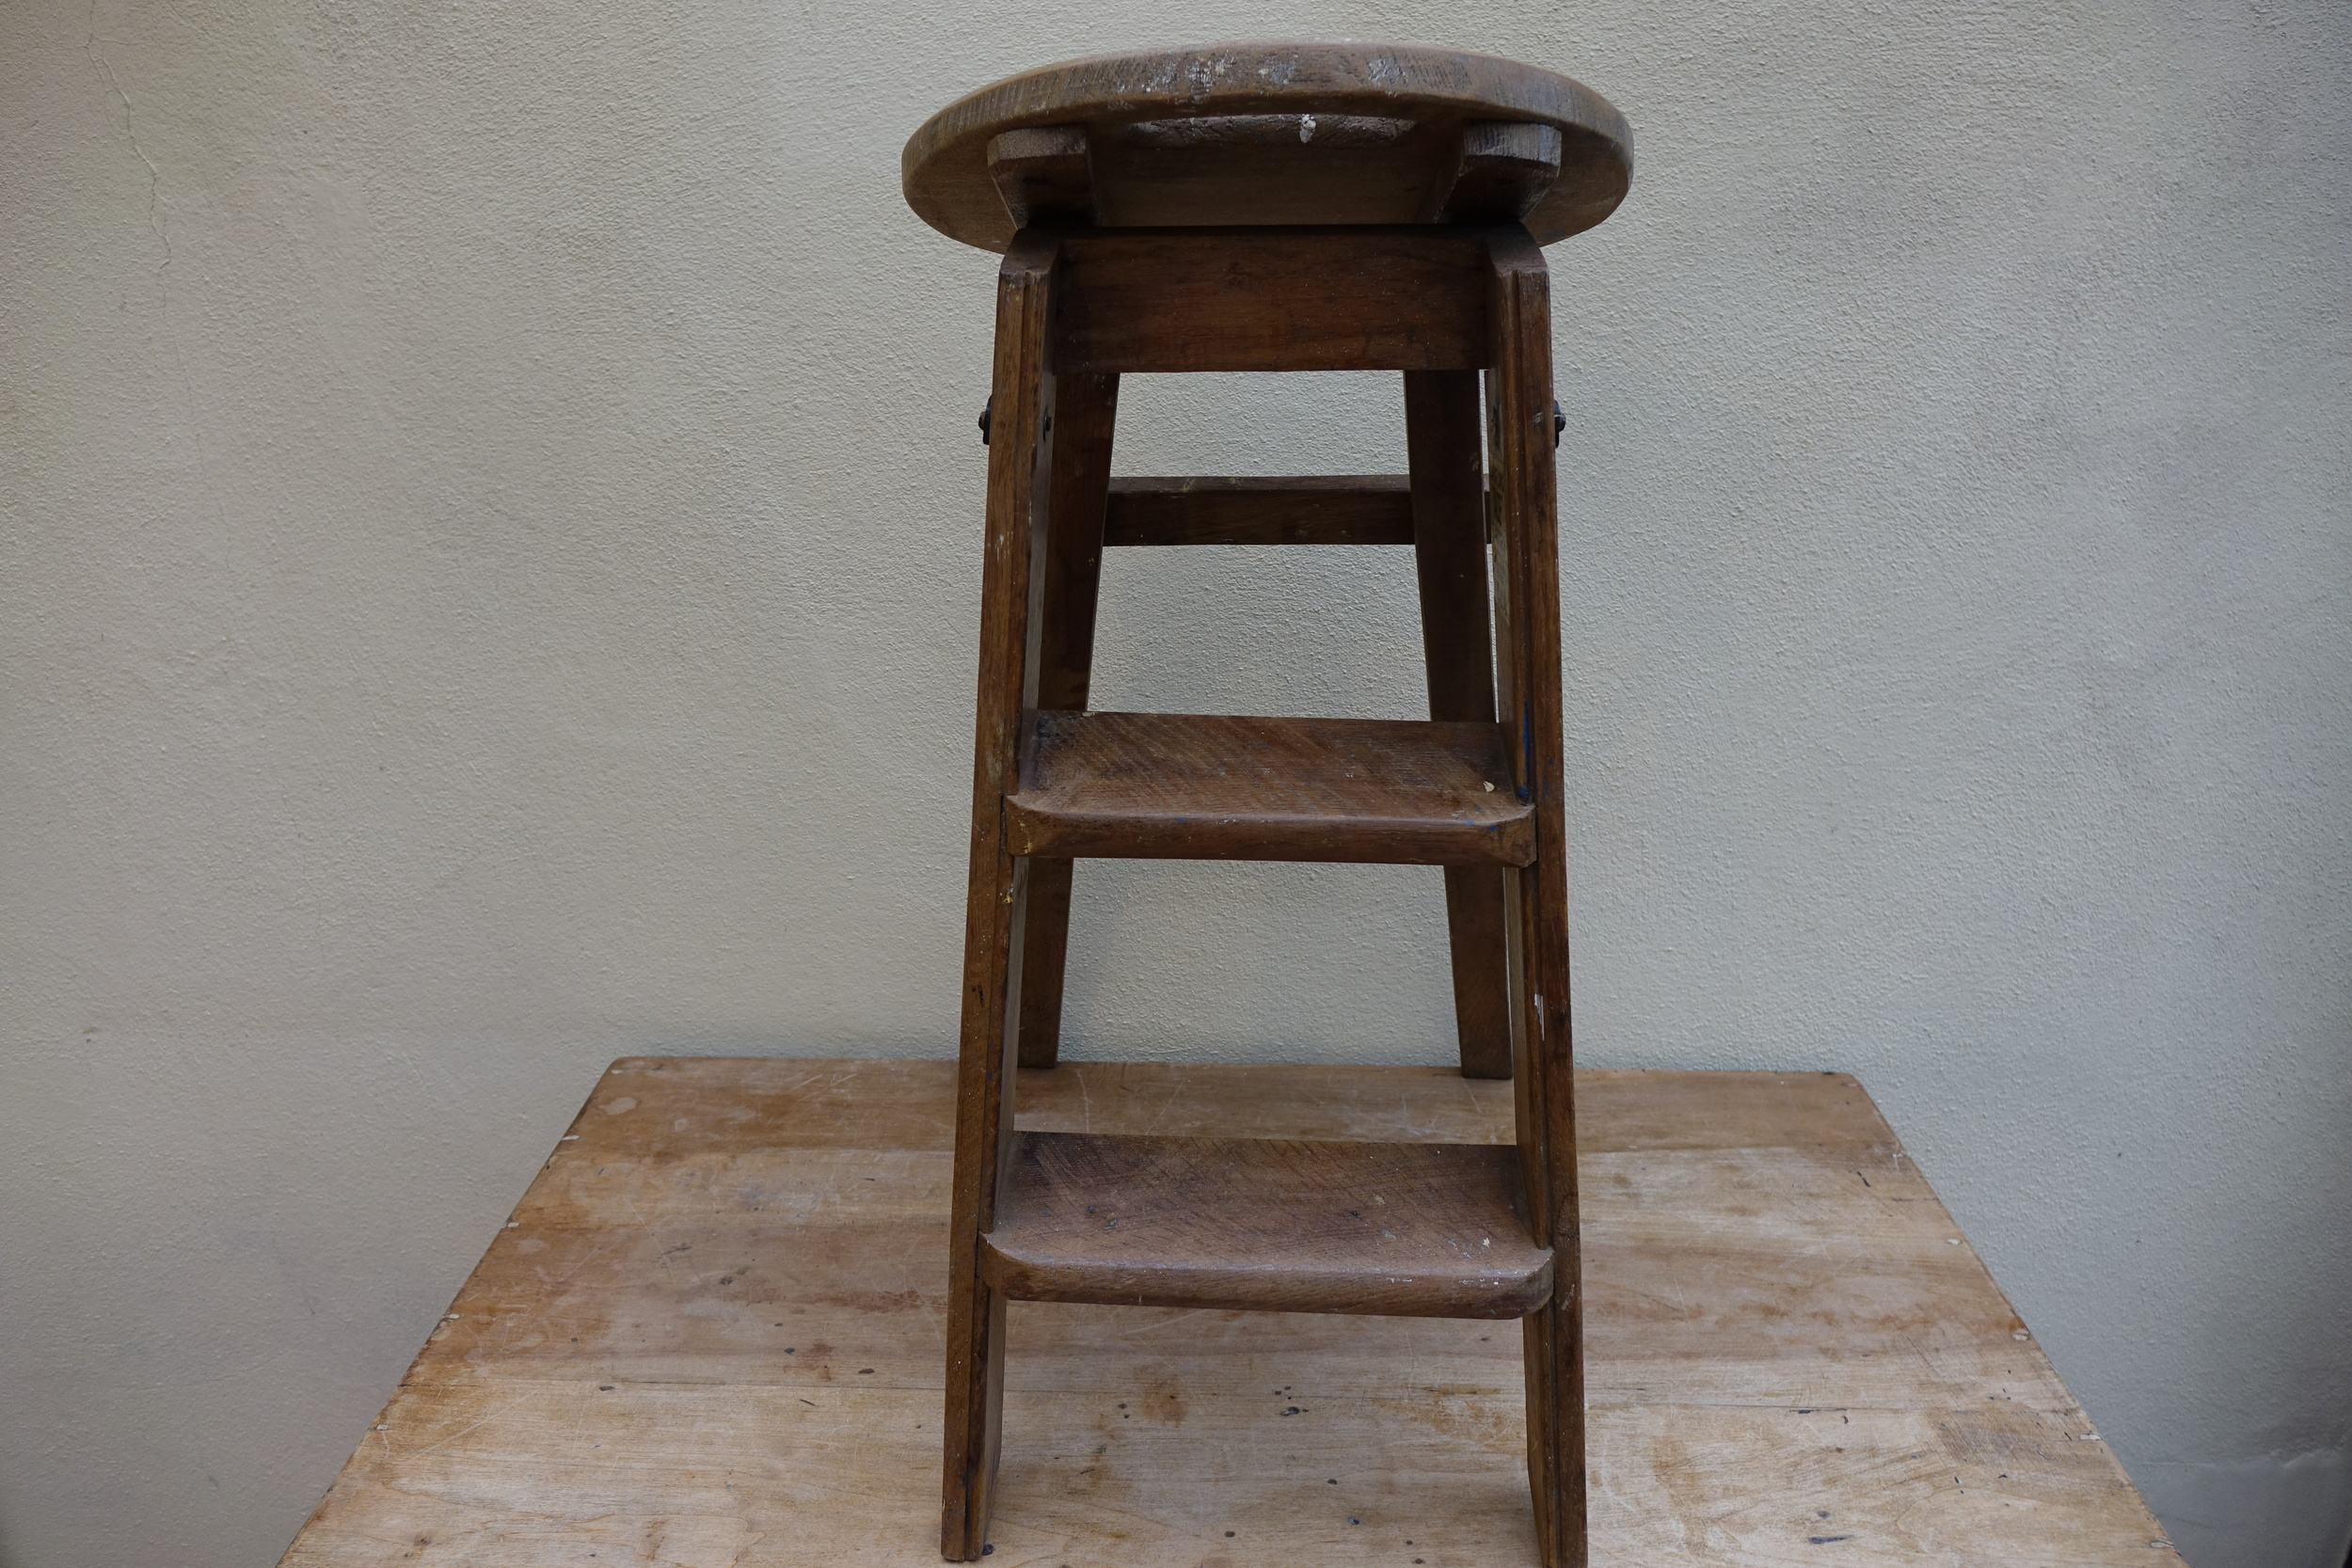 Small Step Ladder £7.50